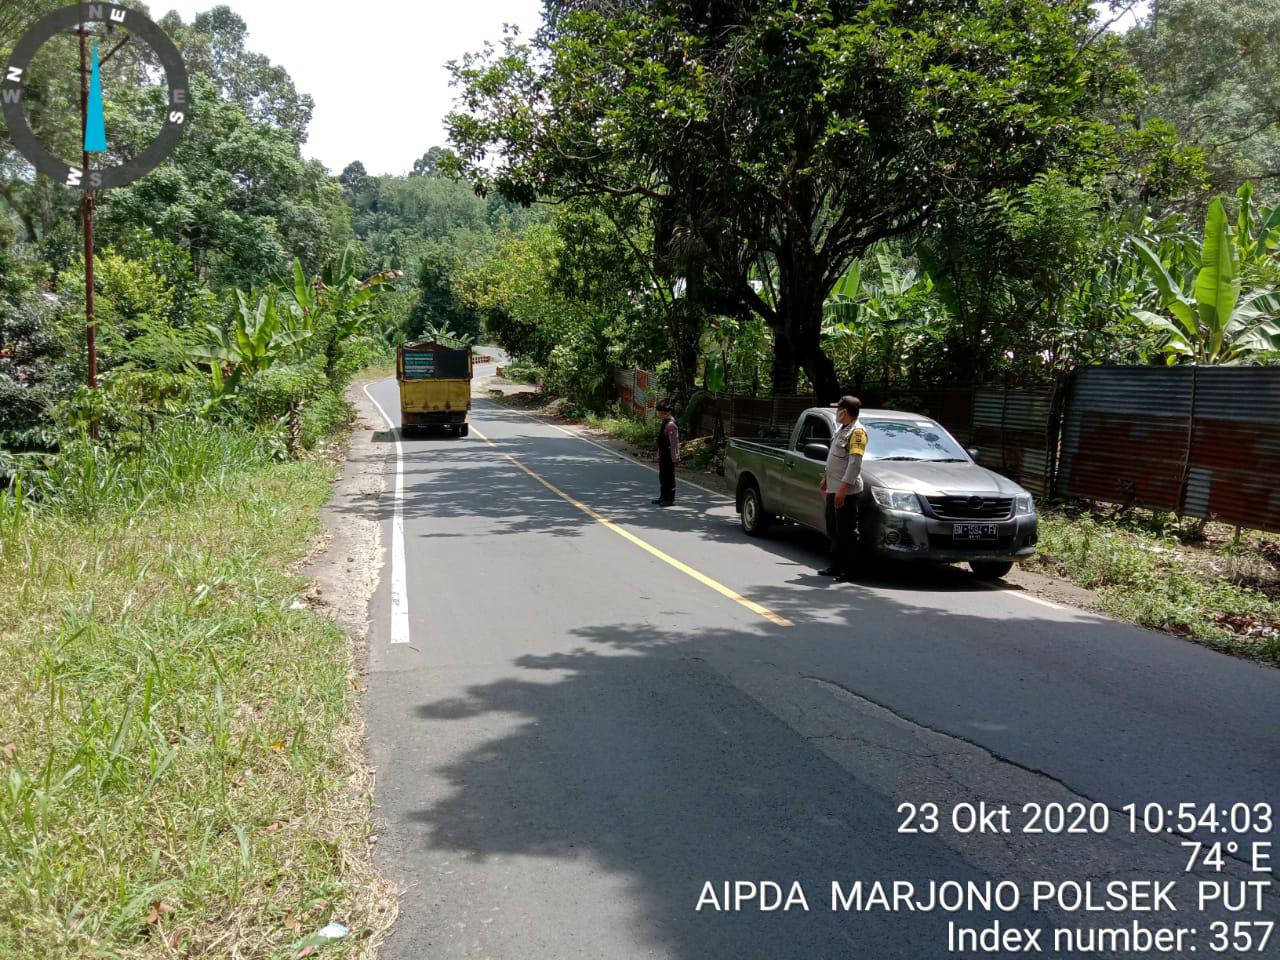 Patroli Polsek Pu Tanding Di Jalur Lintas Curup Padang Ulak Tanding